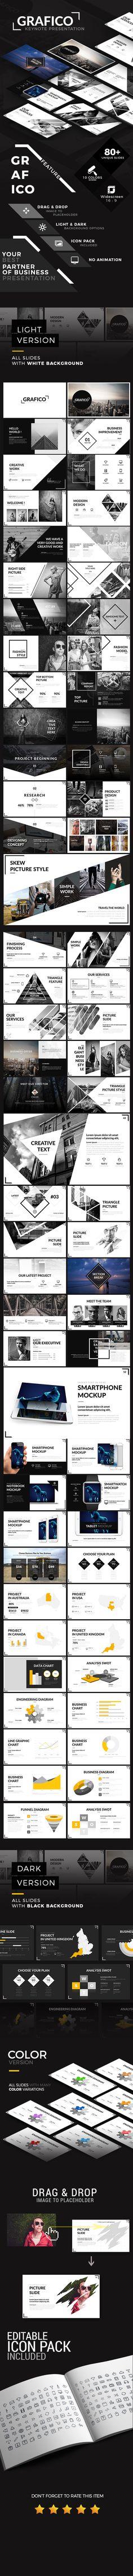 Grafico Keynote Presentation Template - Creative #Keynote #Templates Download here: https://graphicriver.net/item/grafico-keynote-presentation-template/19743917?ref=alena994